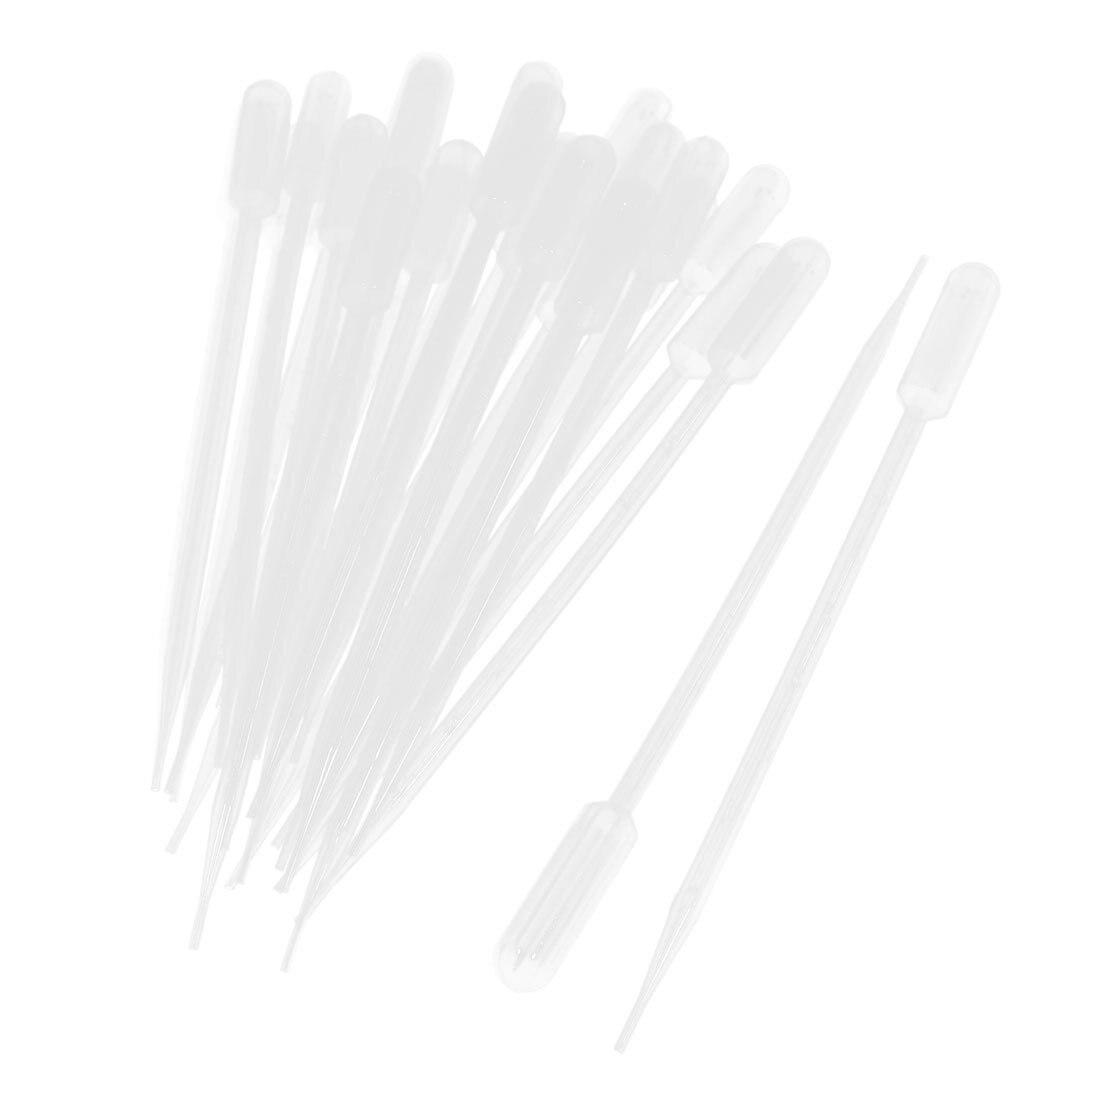 SOSW-50 peças 10ml transferência plástica clara pipet pasteur pipetas conta-gotas